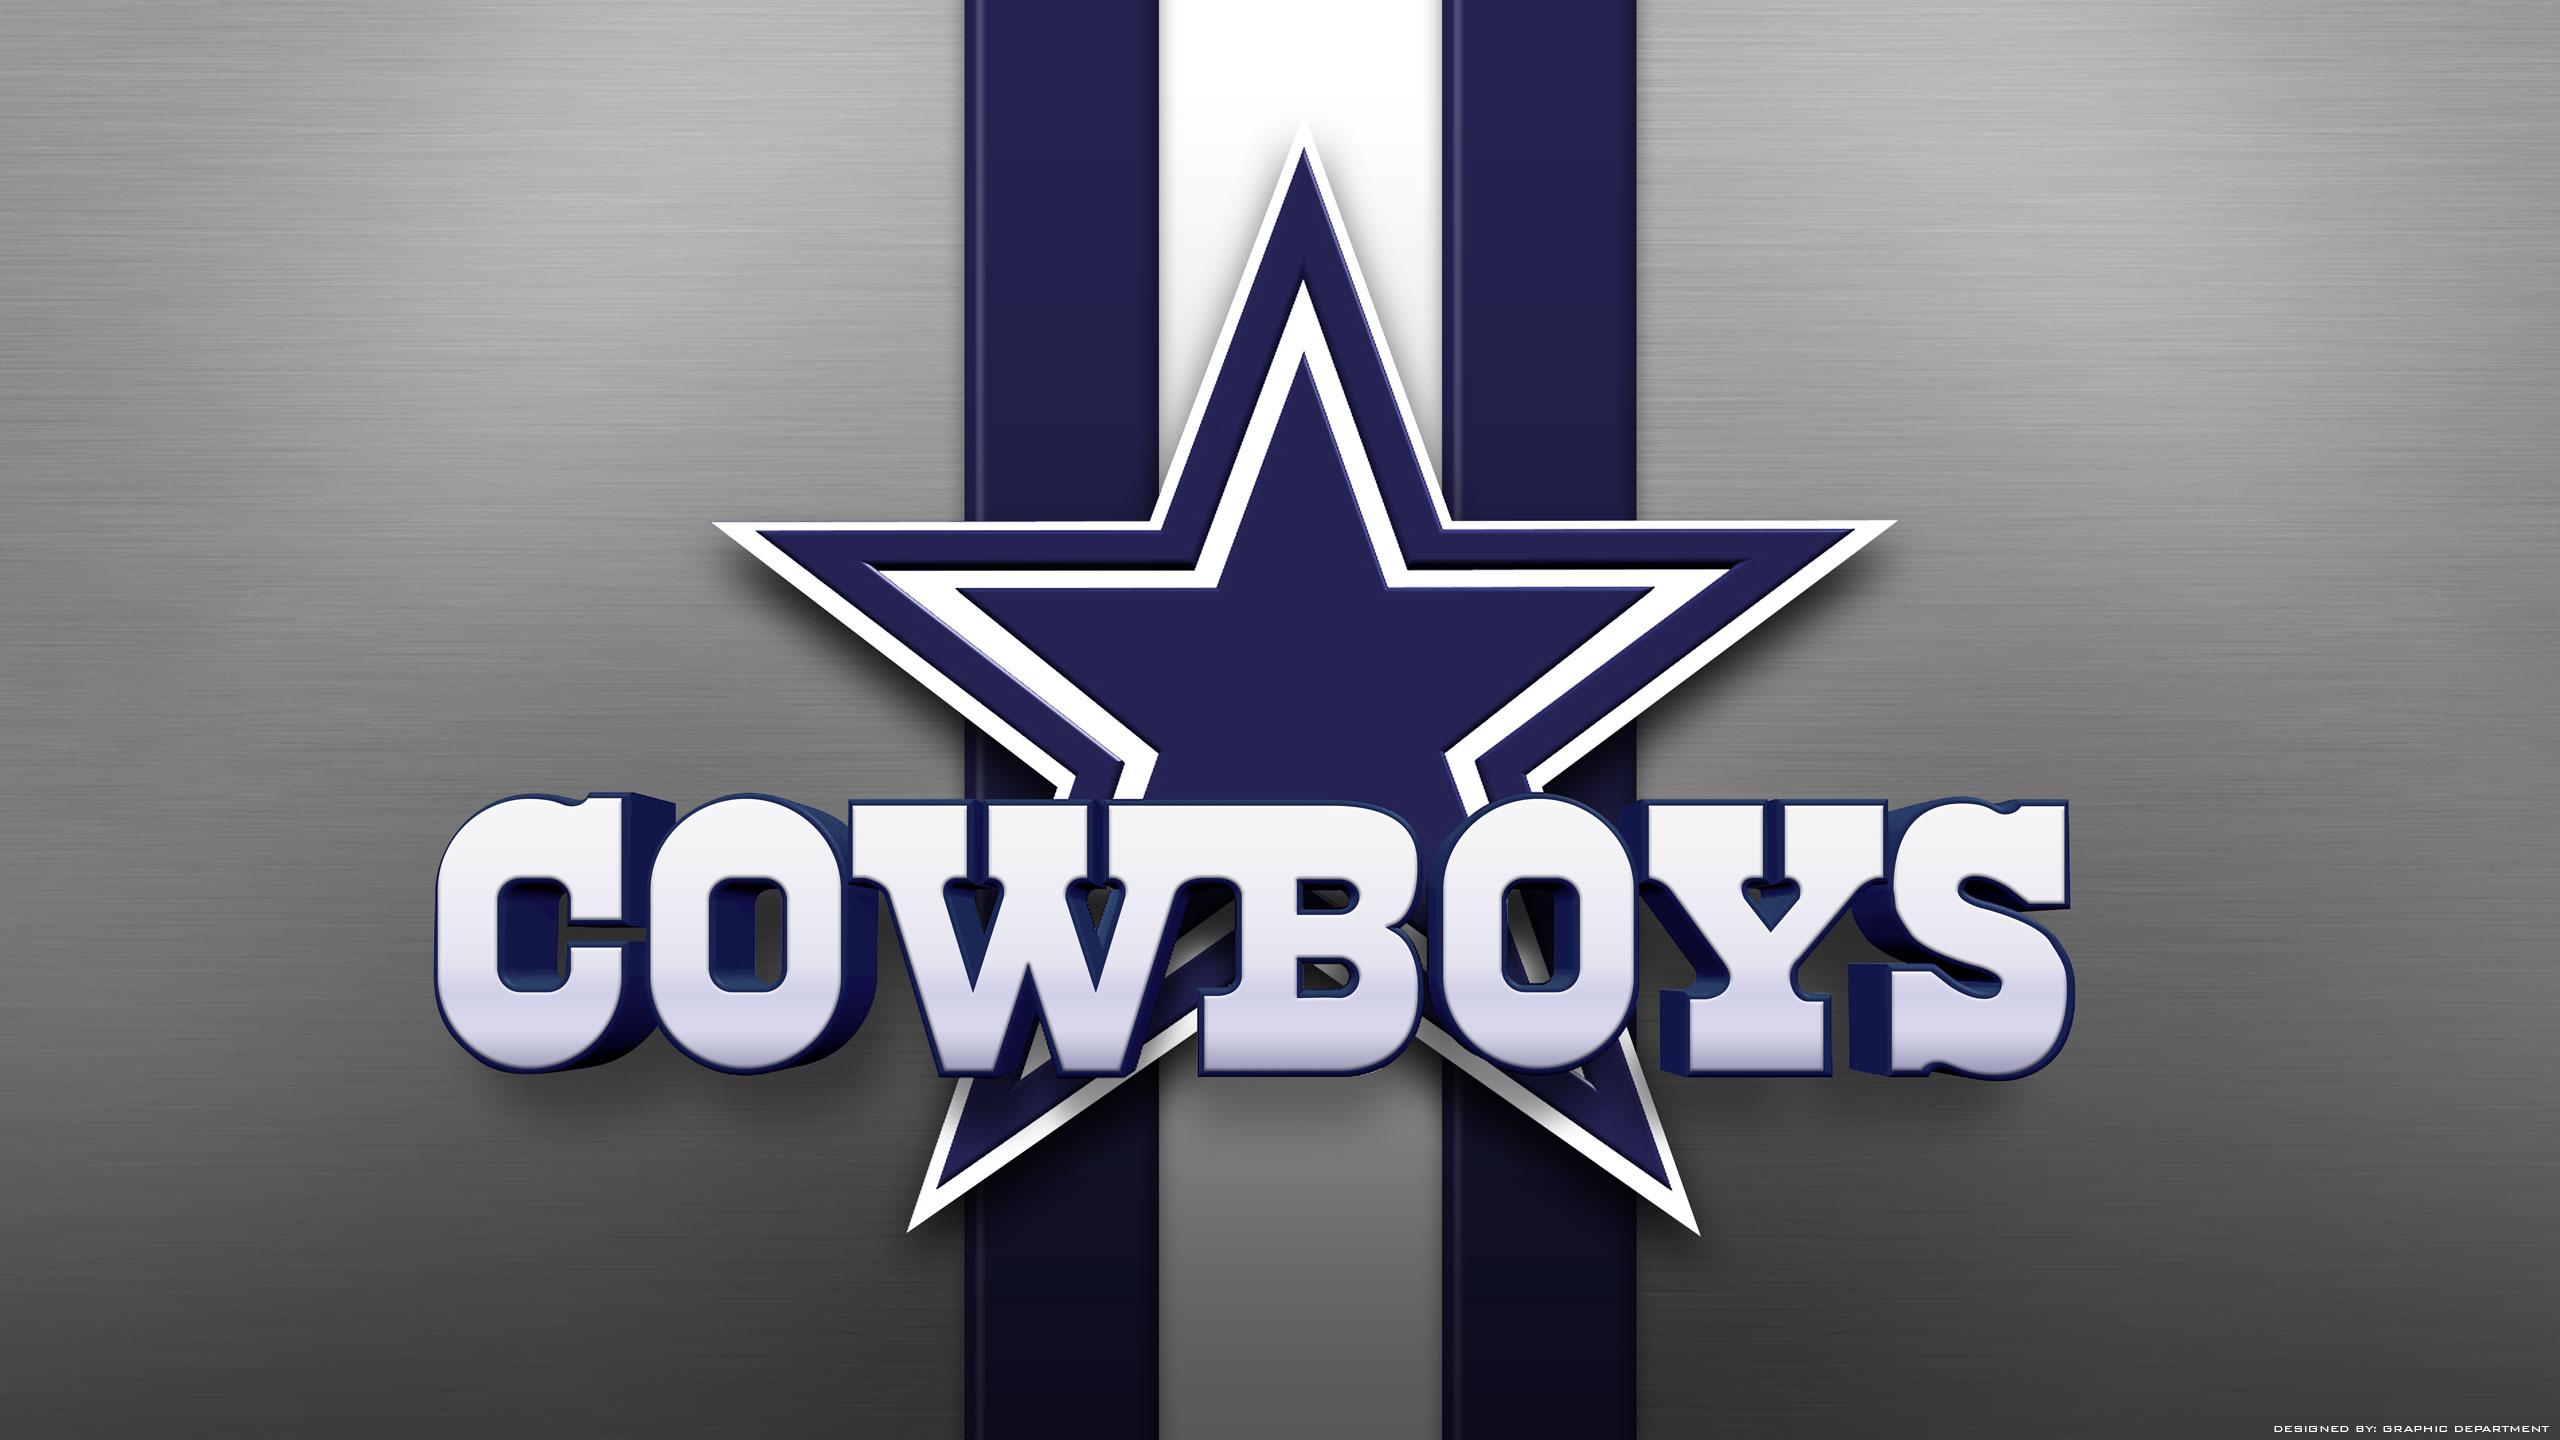 Dallas Cowboys Star Logo wallpaper   1387461 2560x1440